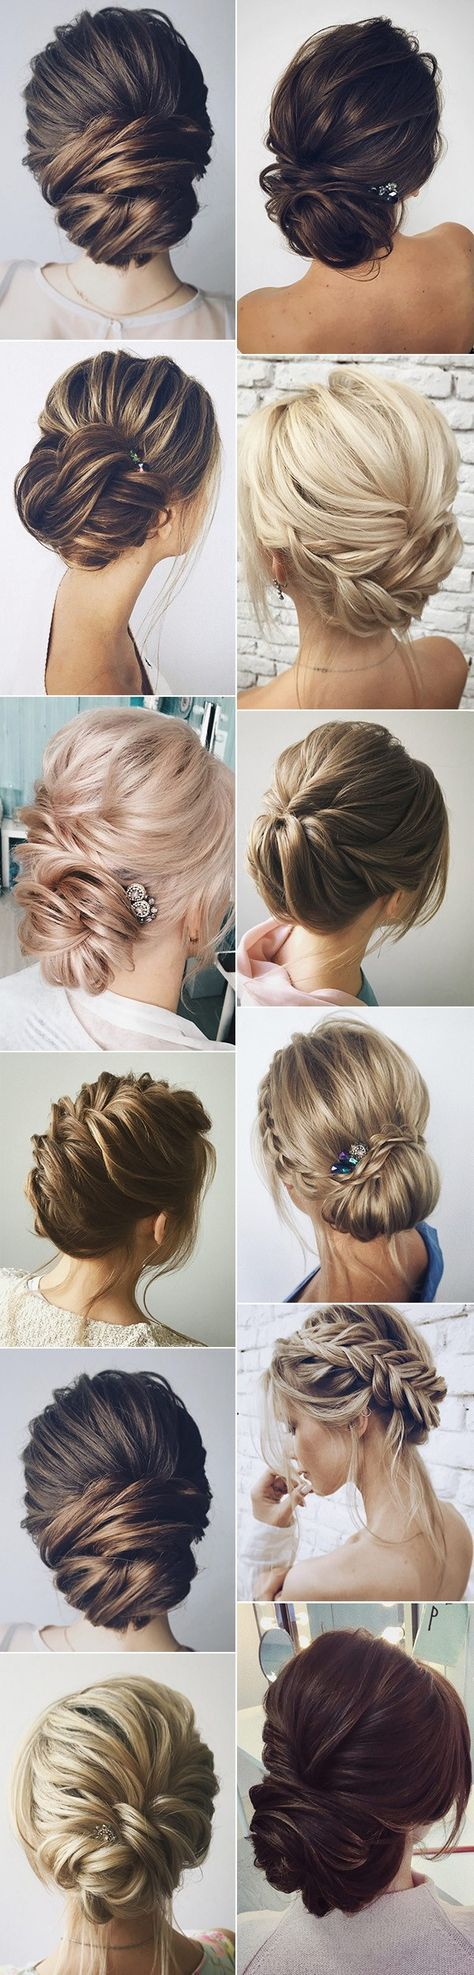 trending updo wedding hairstyles from instagram updos weddings